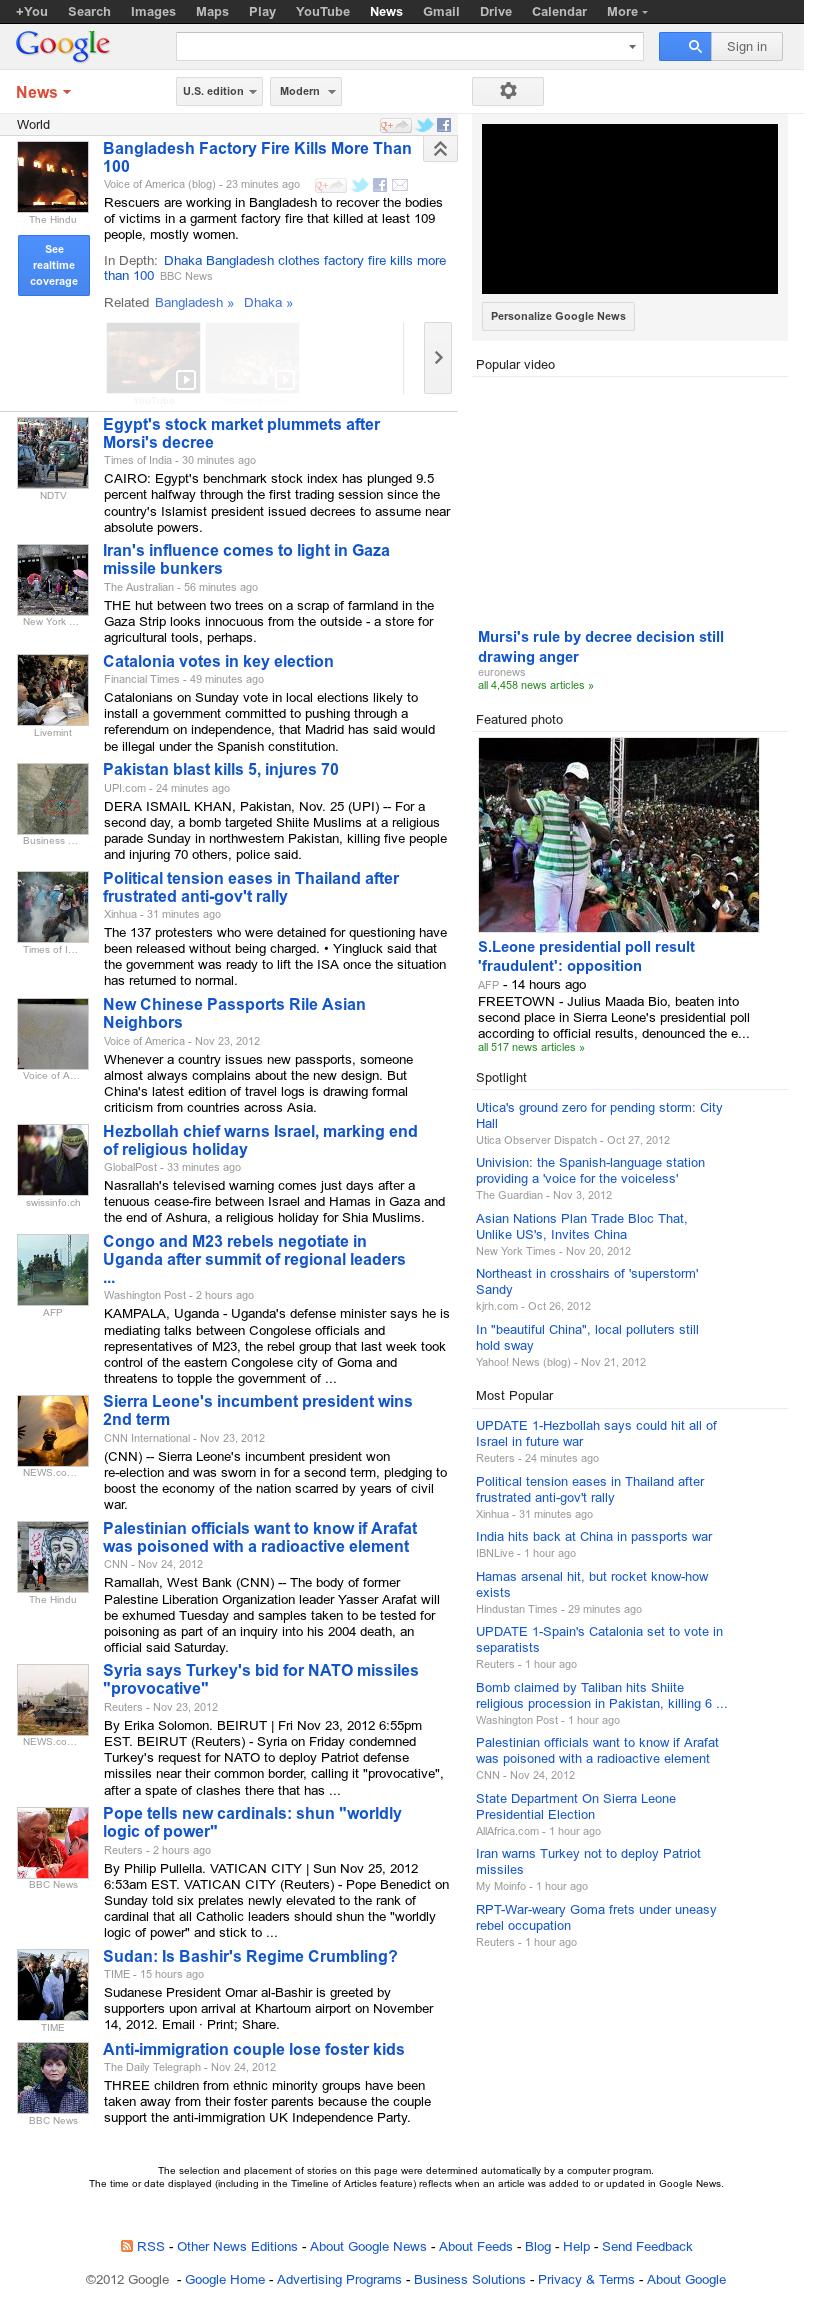 Google News: World at Sunday Nov. 25, 2012, 2:12 p.m. UTC